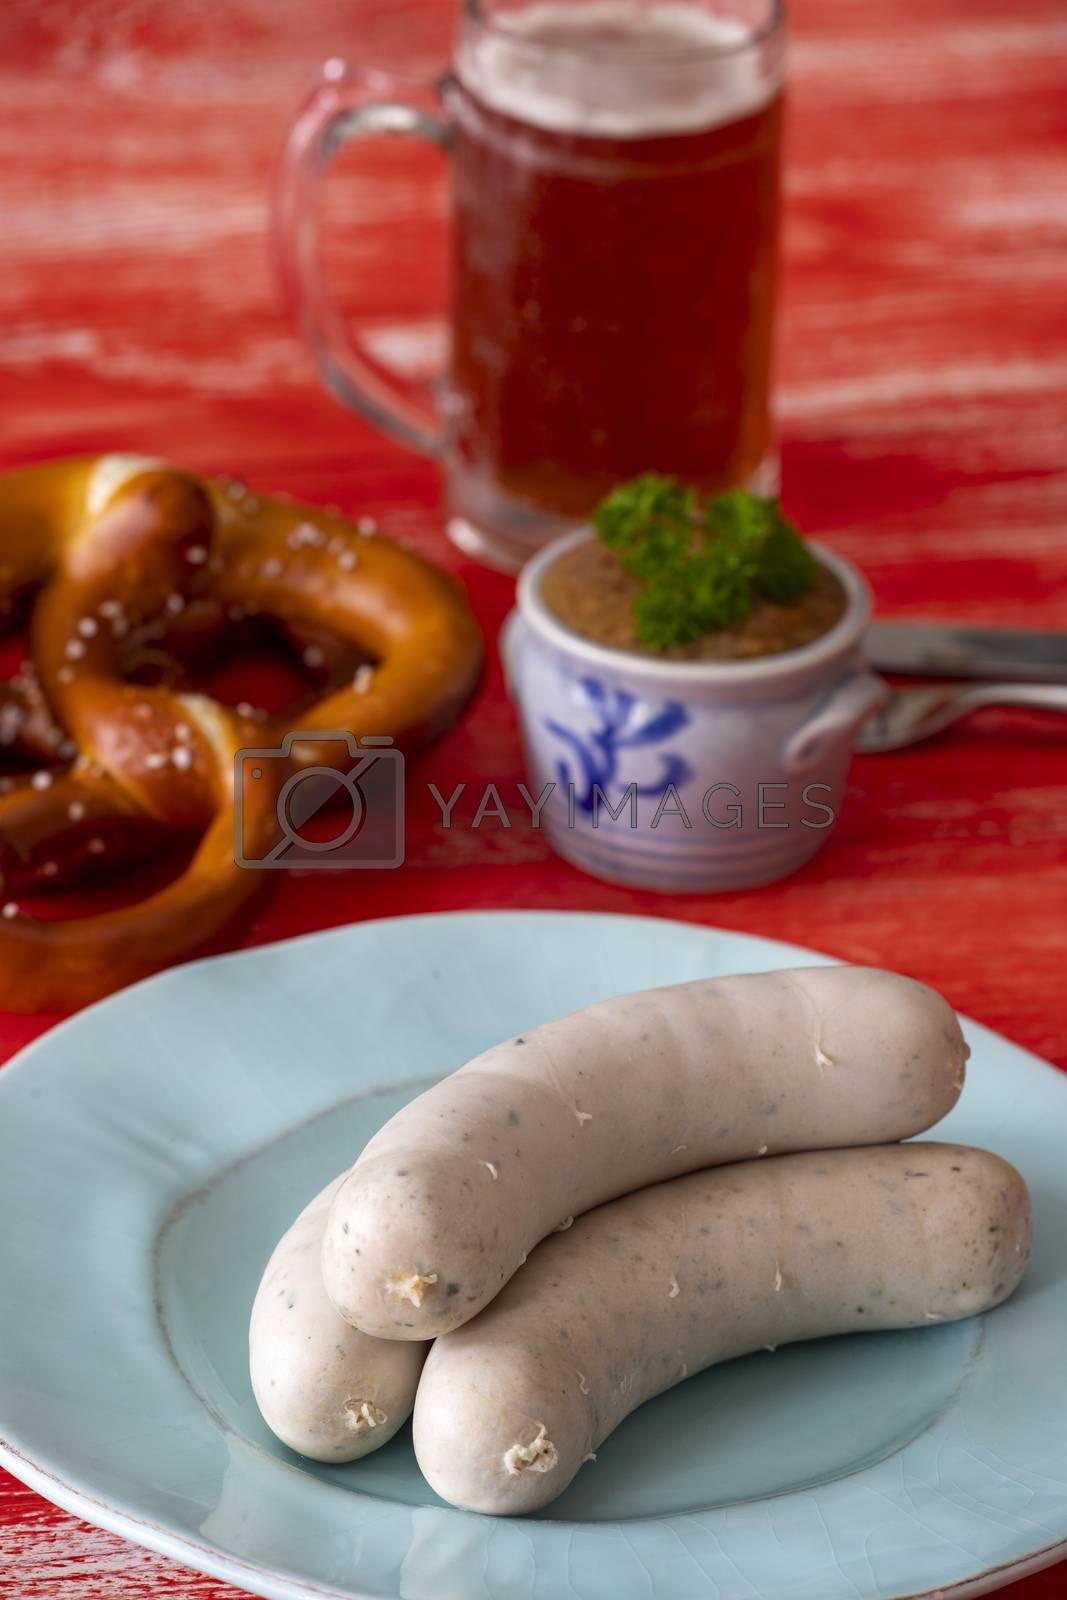 bavarian white sausage on red background